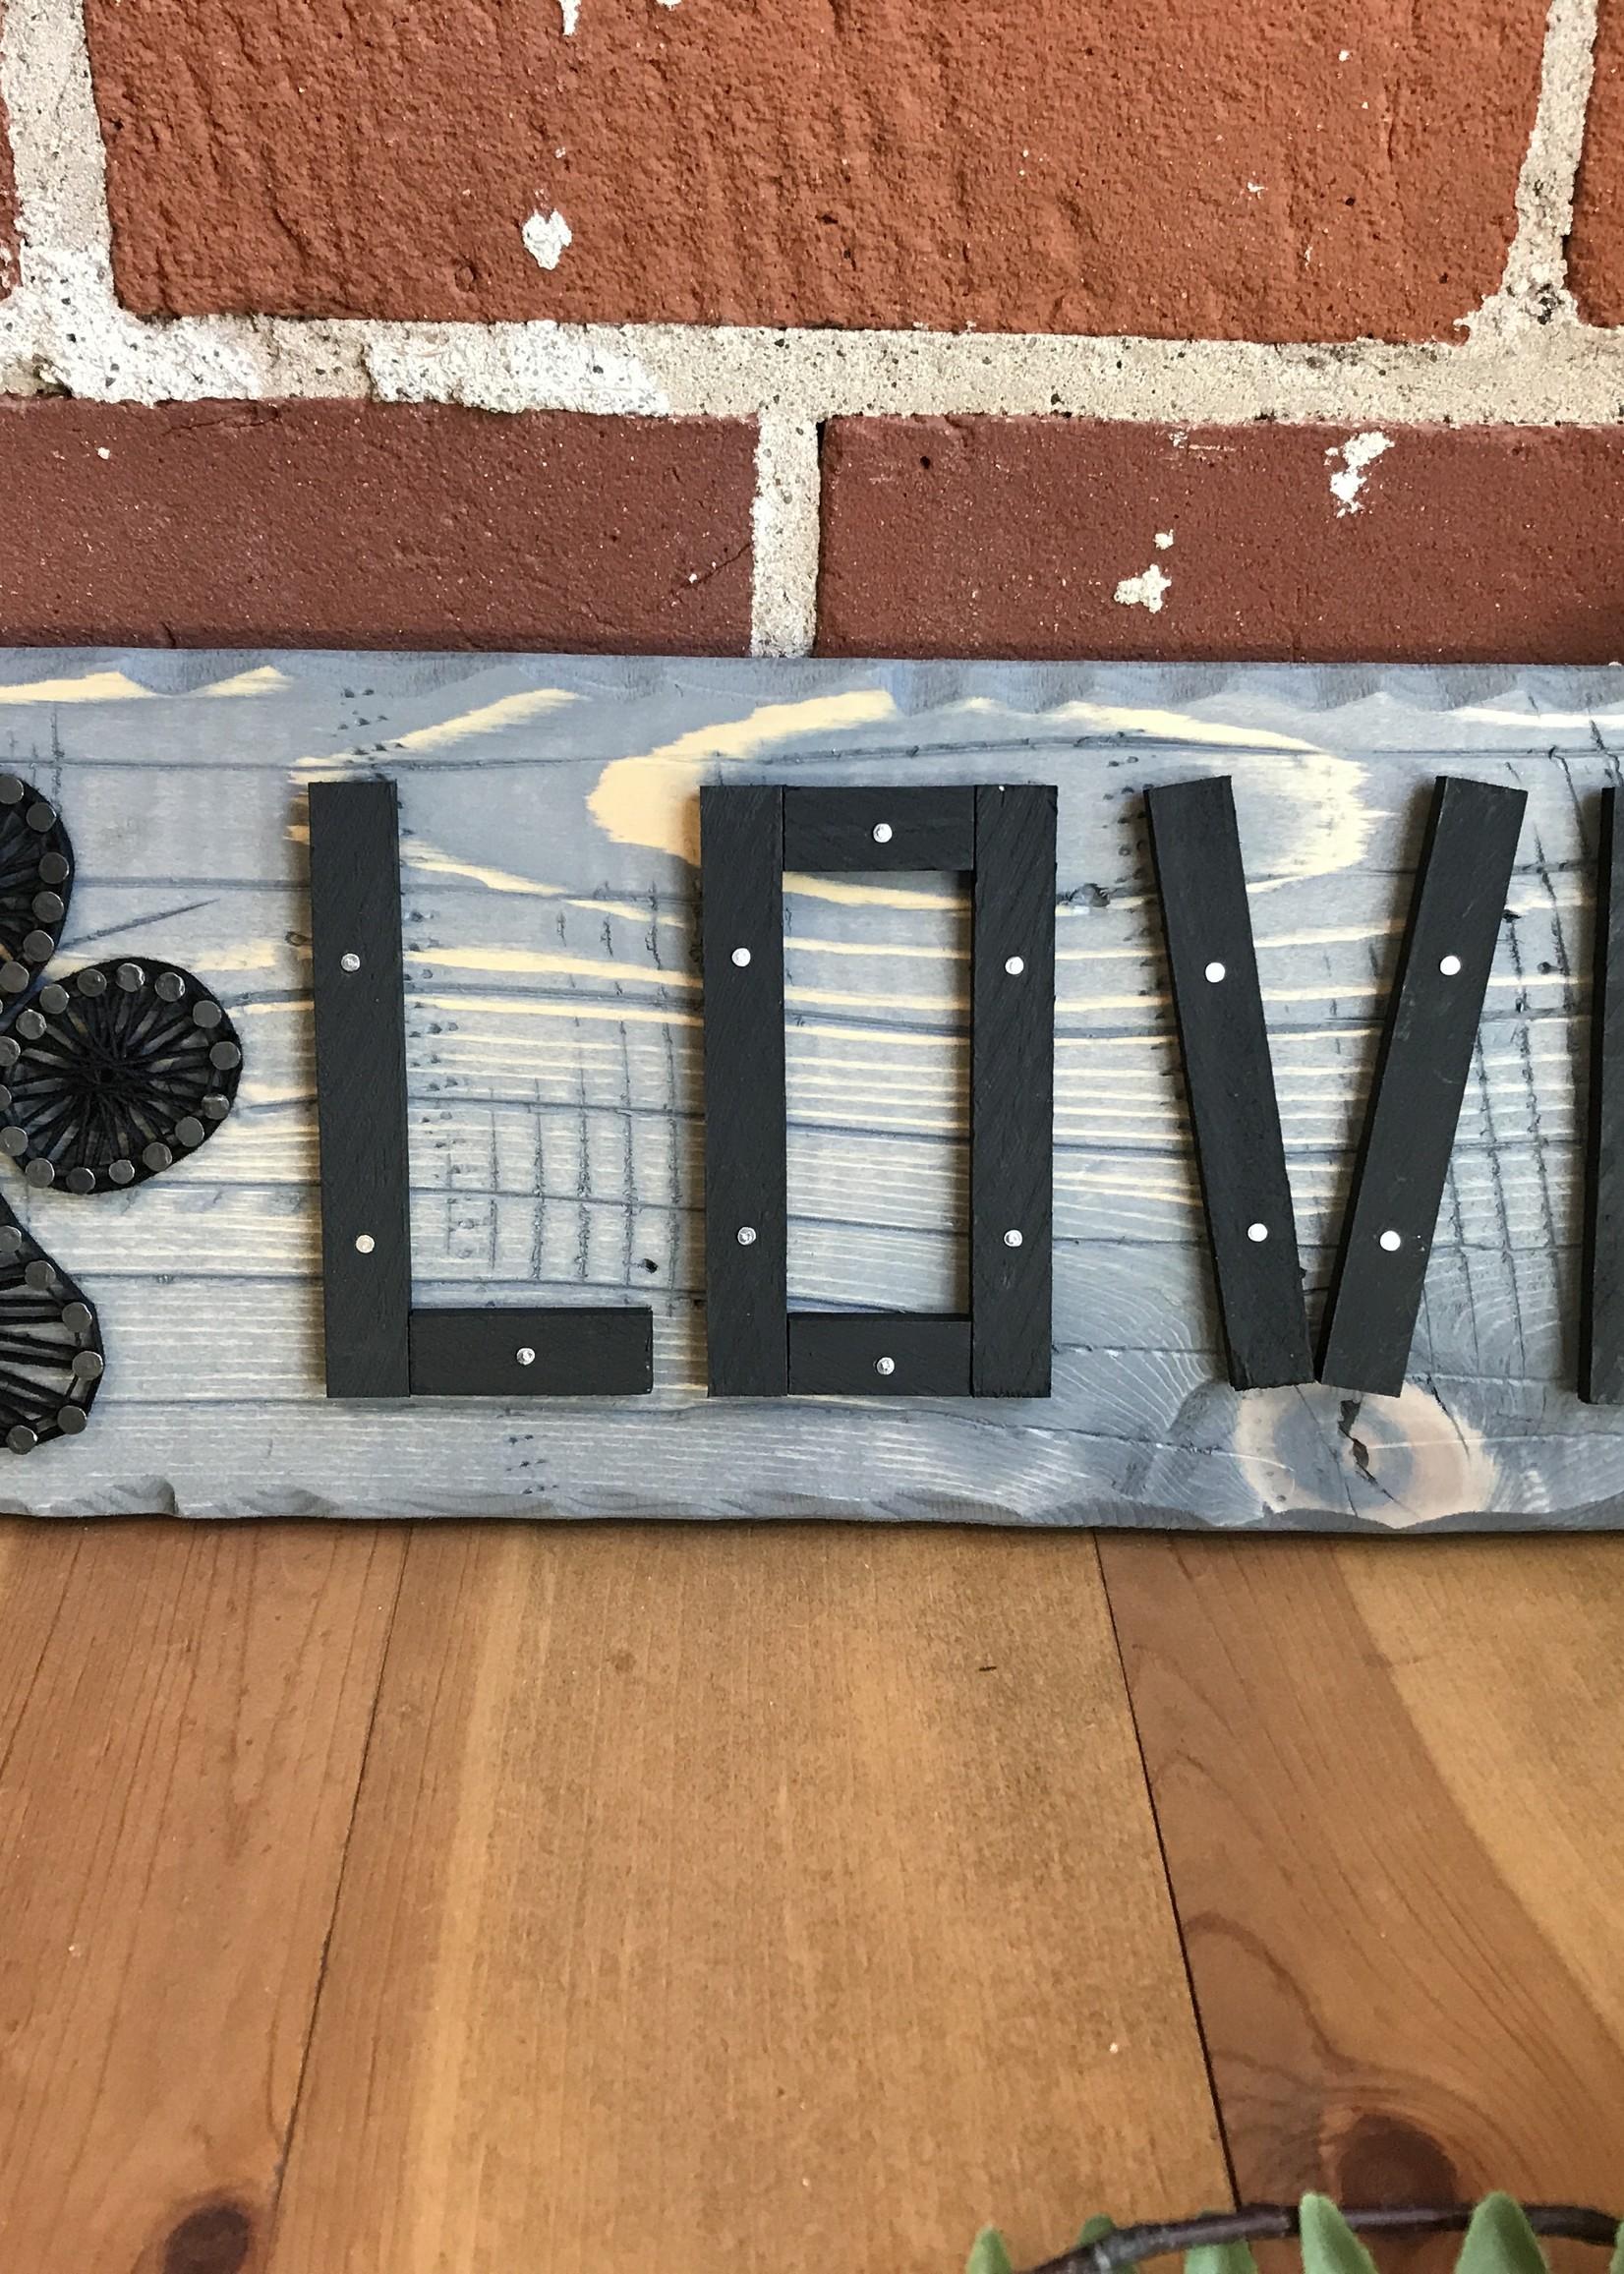 Paw Love String Art - Grant and Sandy Burdick